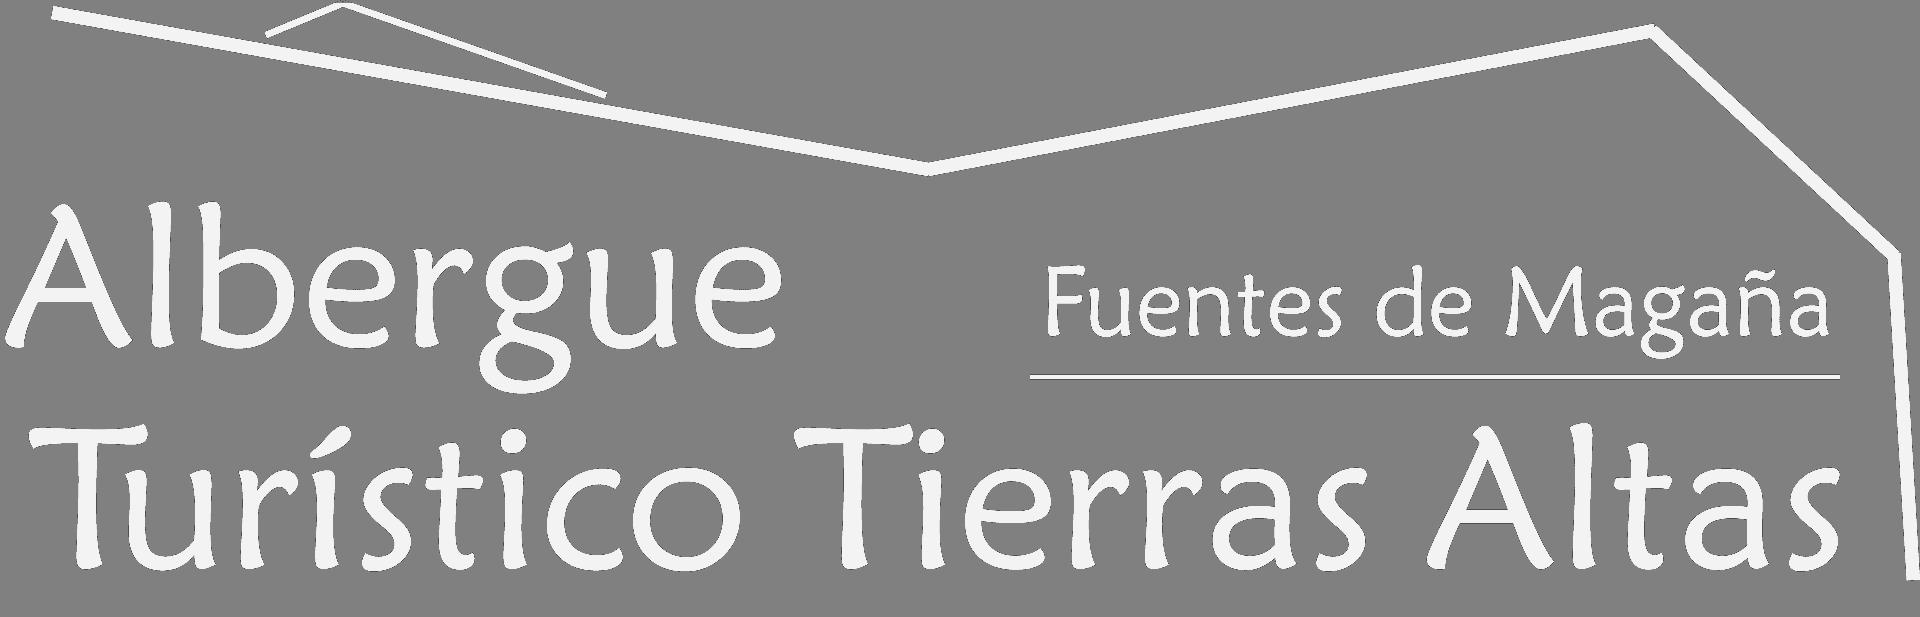 LogoAlbergue2021bb (1)